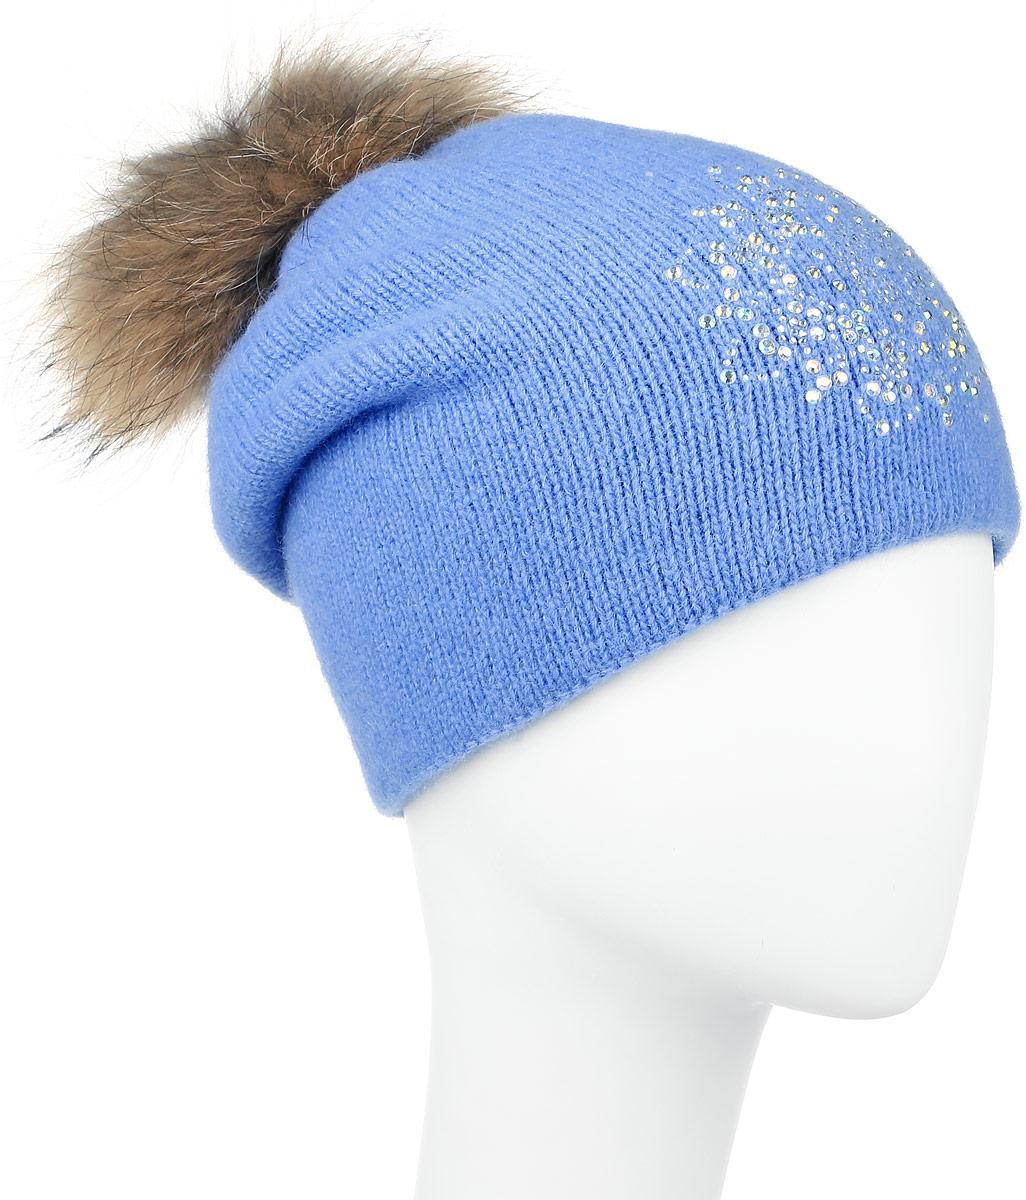 Шапка Finn Flare шапка женская finn flare цвет темно синий синий w16 32120 101 размер 56 page 8 page 10